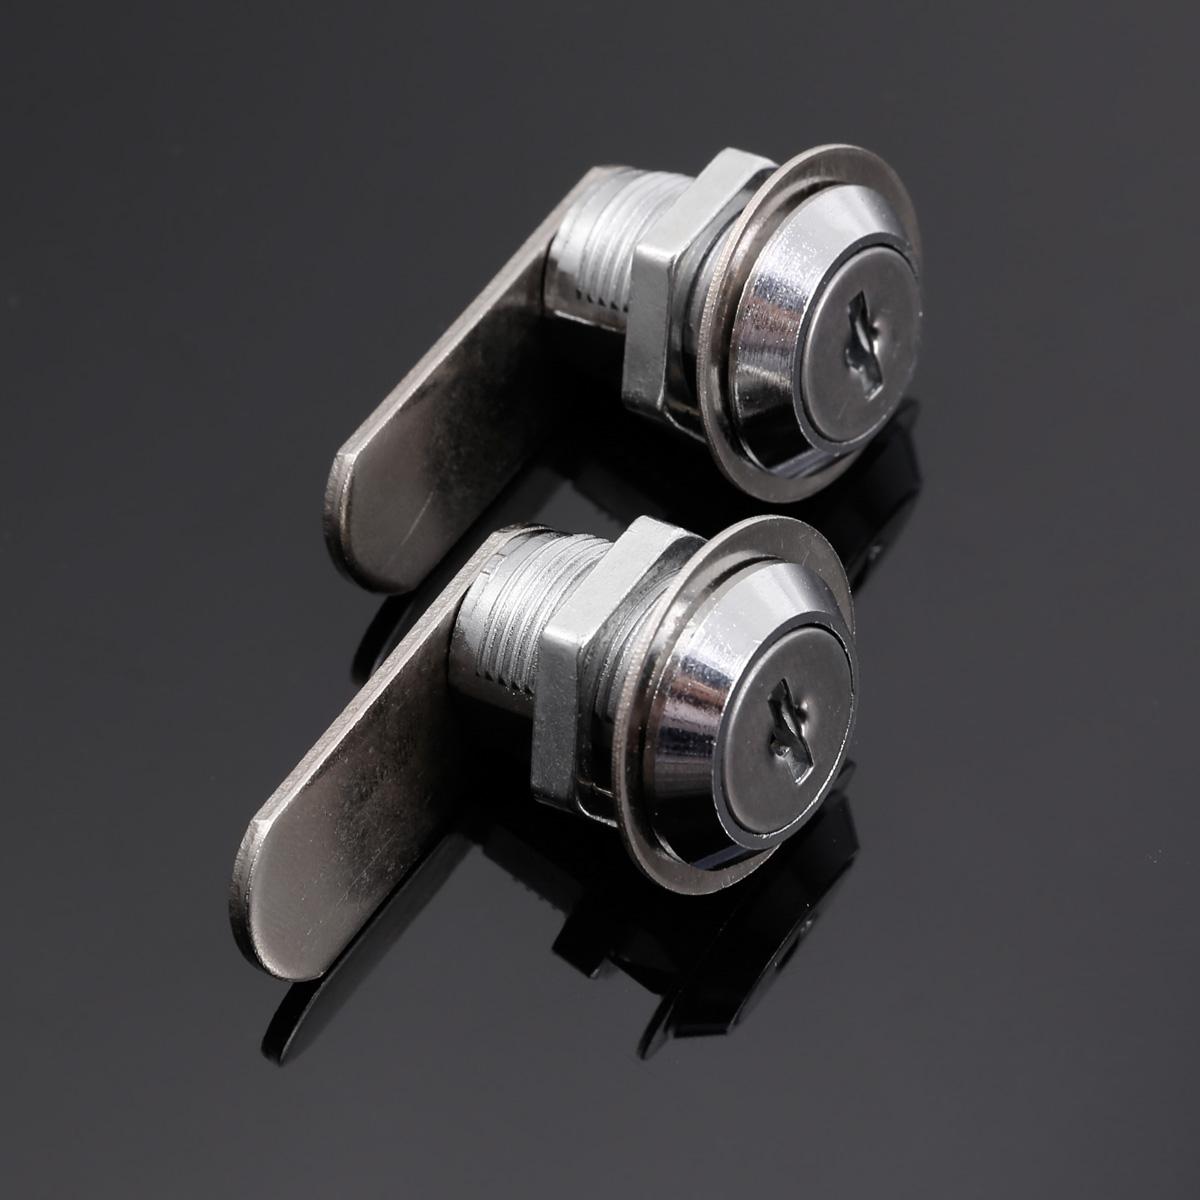 20mm 30mm Cam Lock Cylinder Barrel W Keys For Drawers